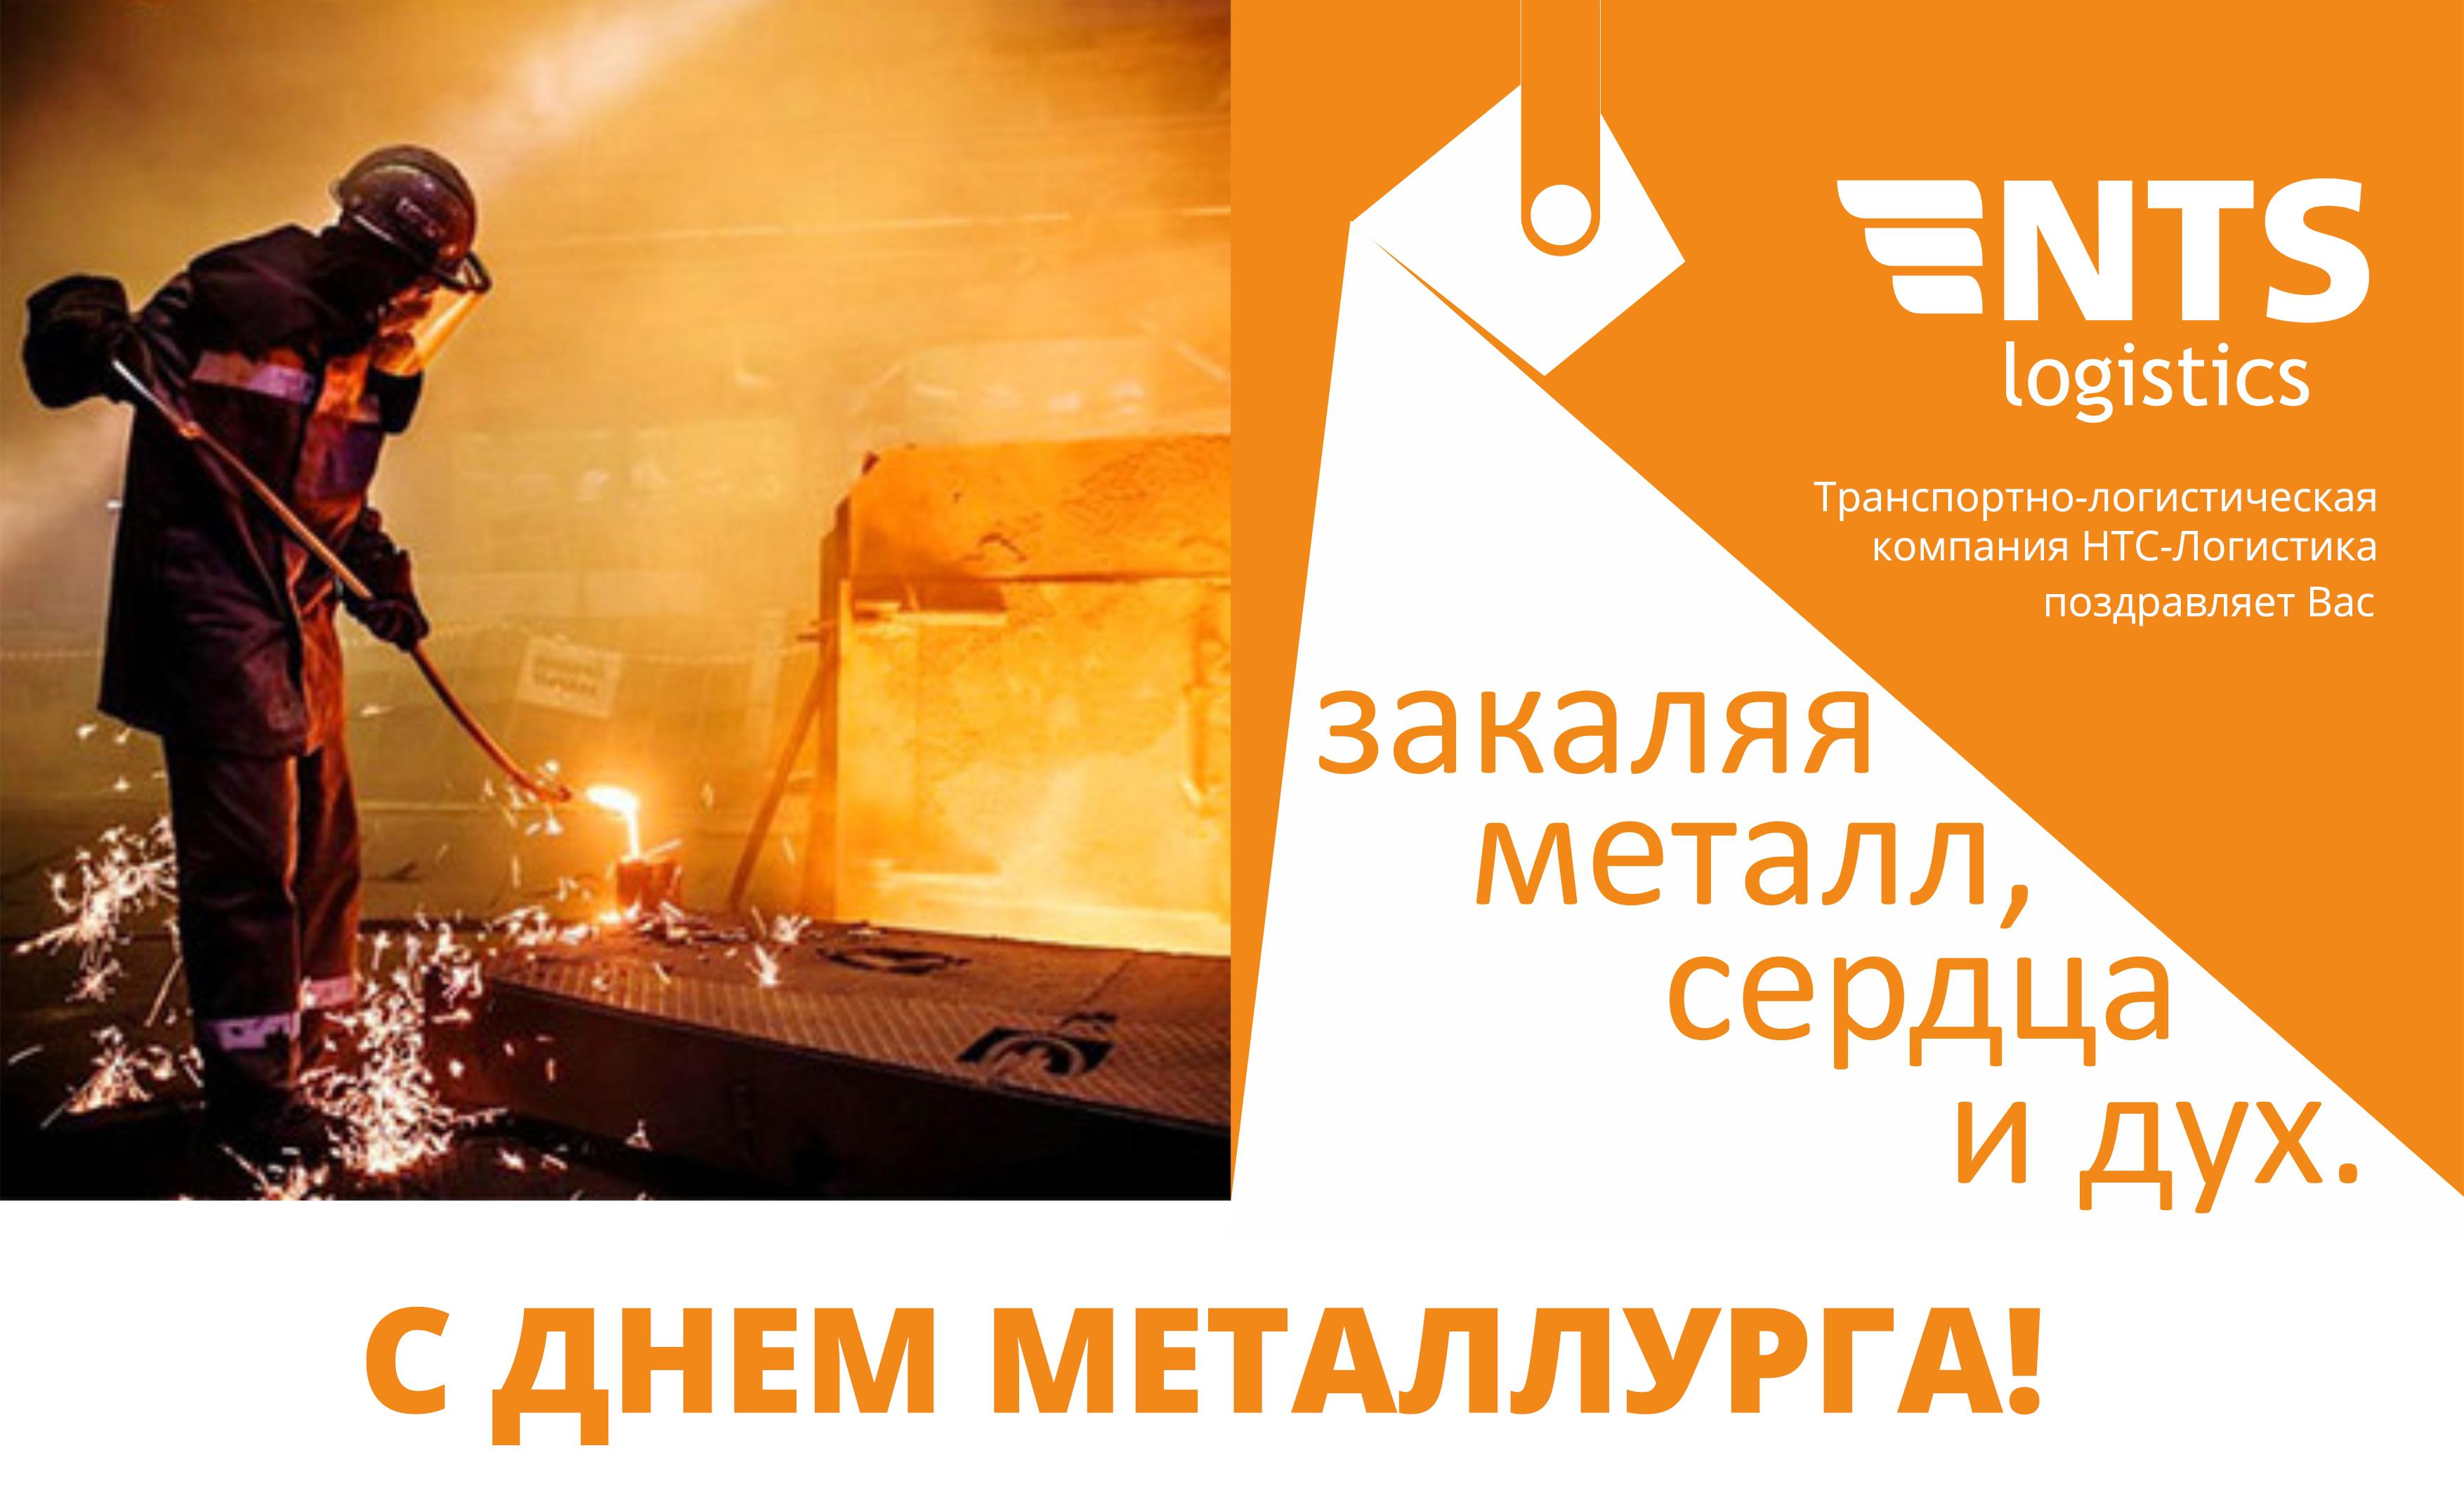 НТС-Логистика поздравляет с днем металлургов